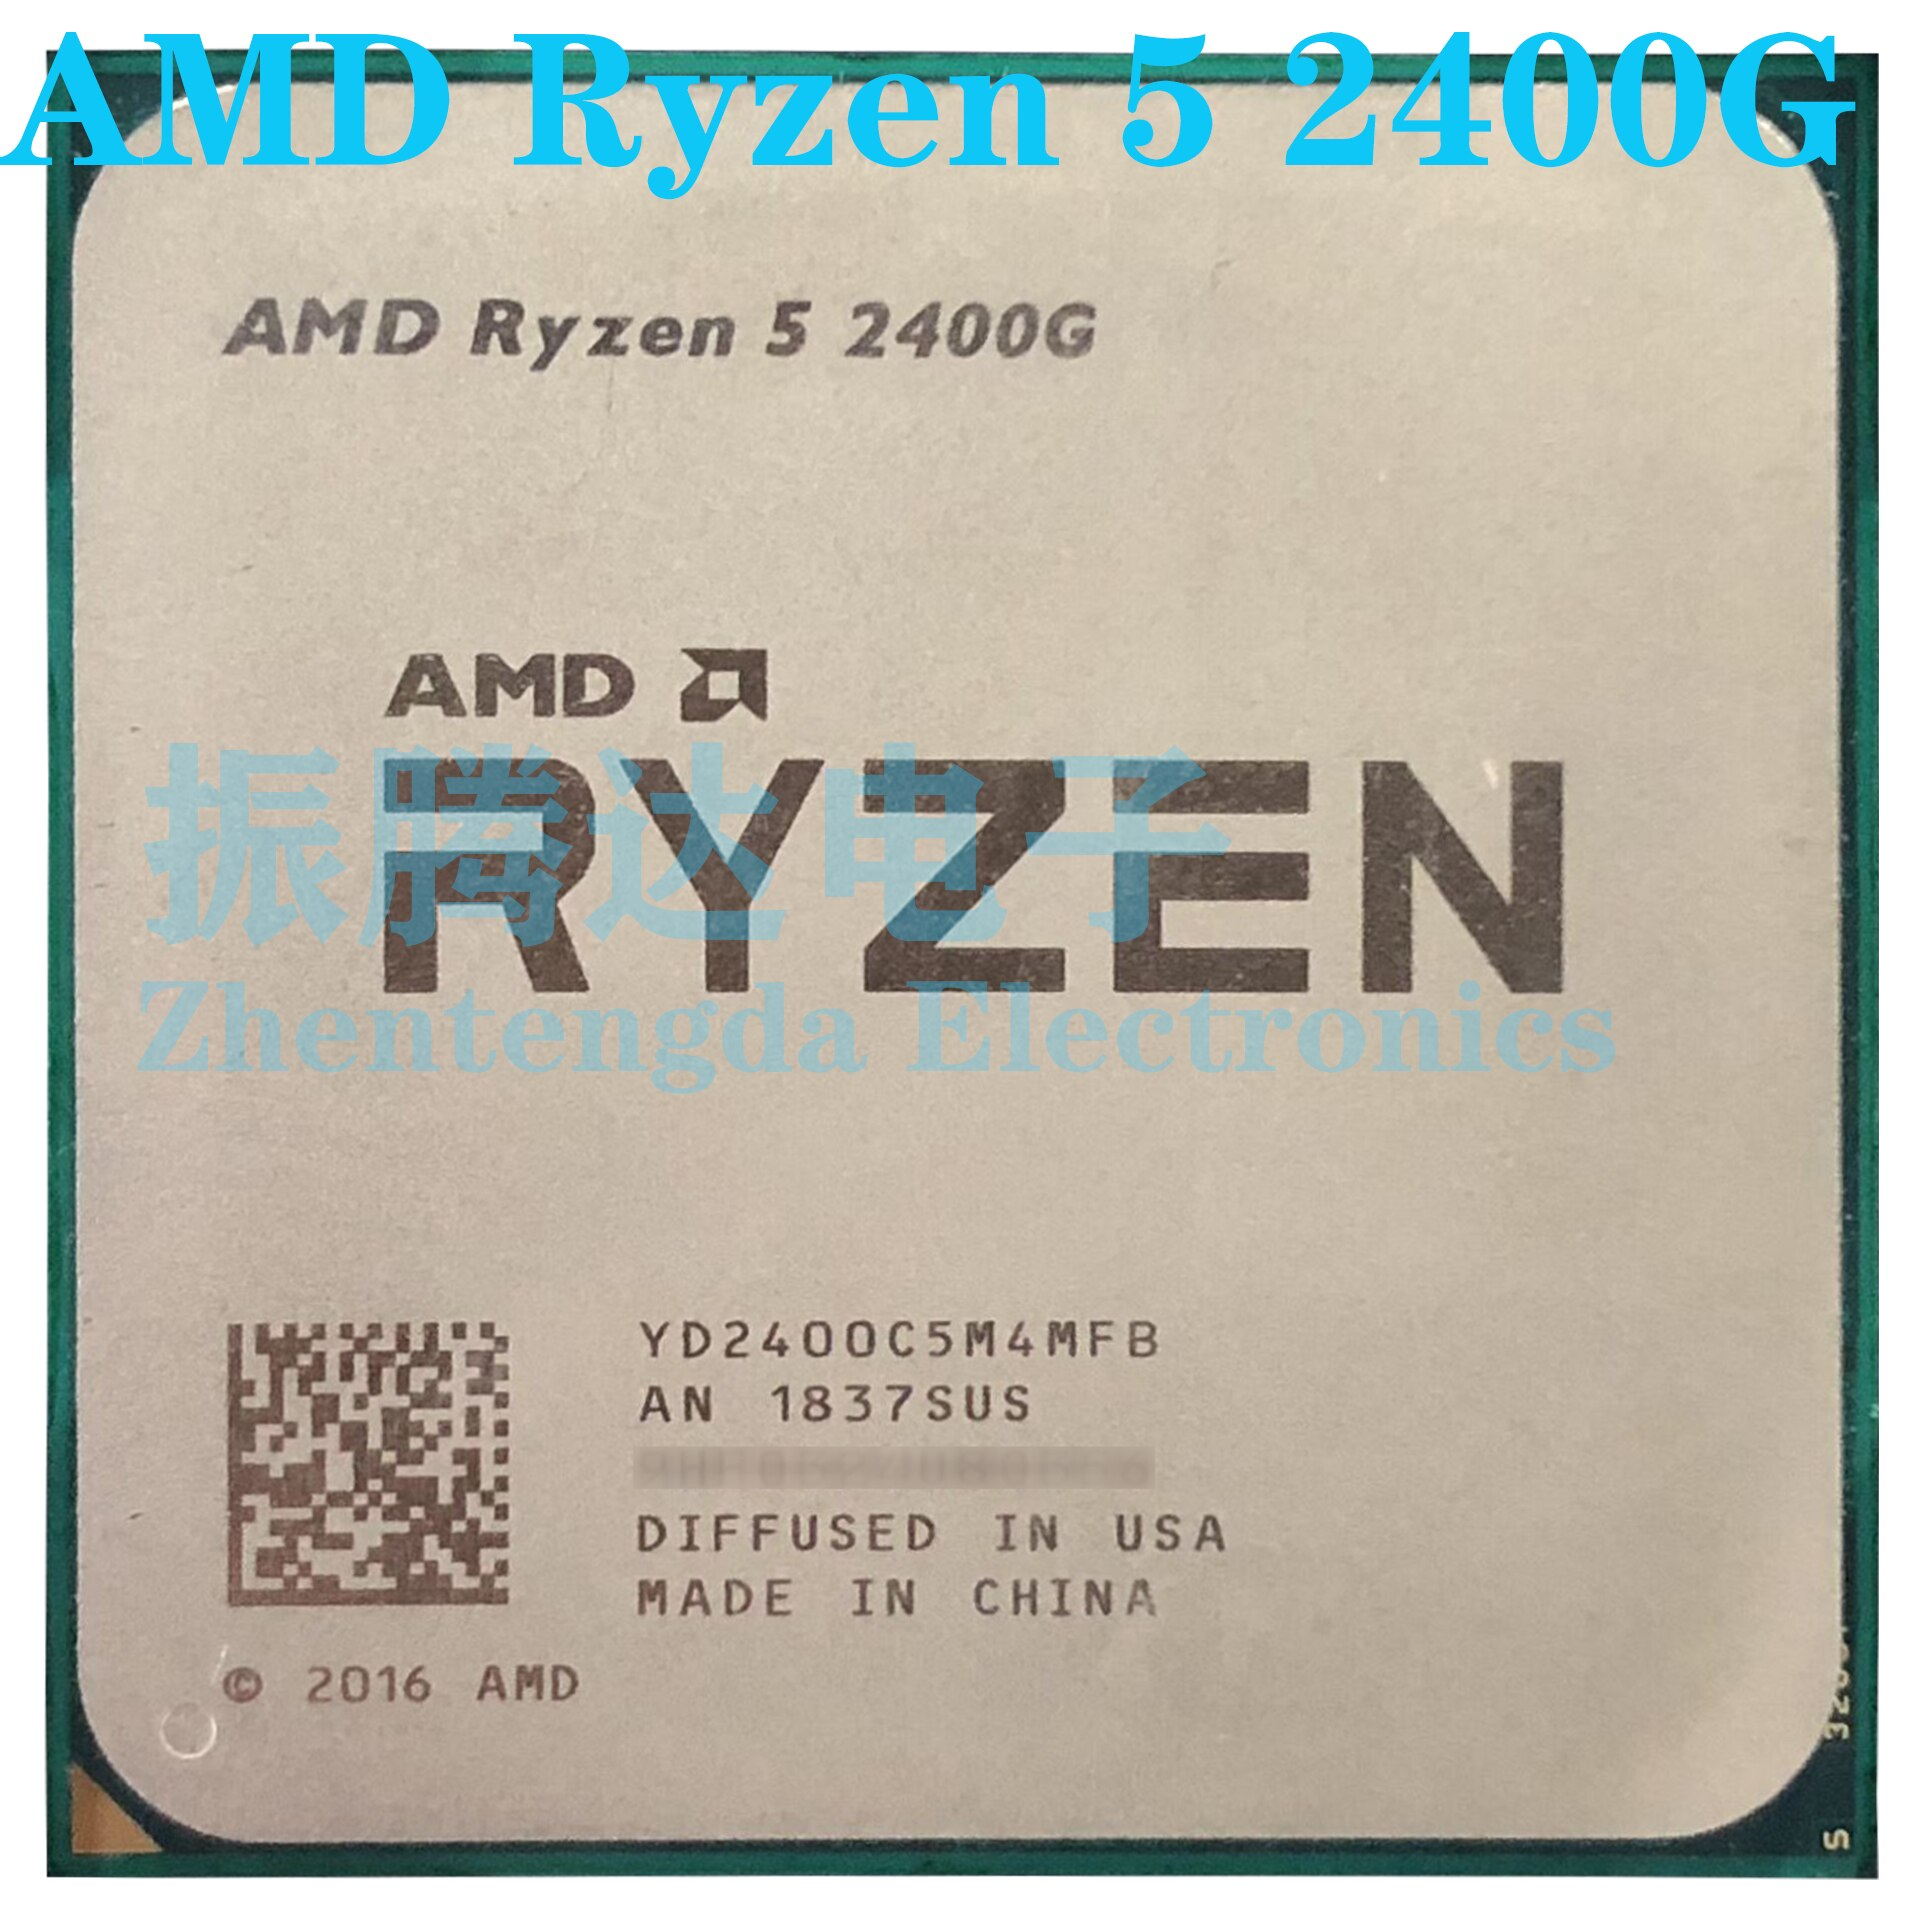 AMD Ryzen 5 2400G وحدة المعالجة المركزية 3.6GHz 4MB 4 النواة 8 موضوع المقبس AM4 R5-2400G معالج وحدة المعالجة المركزية